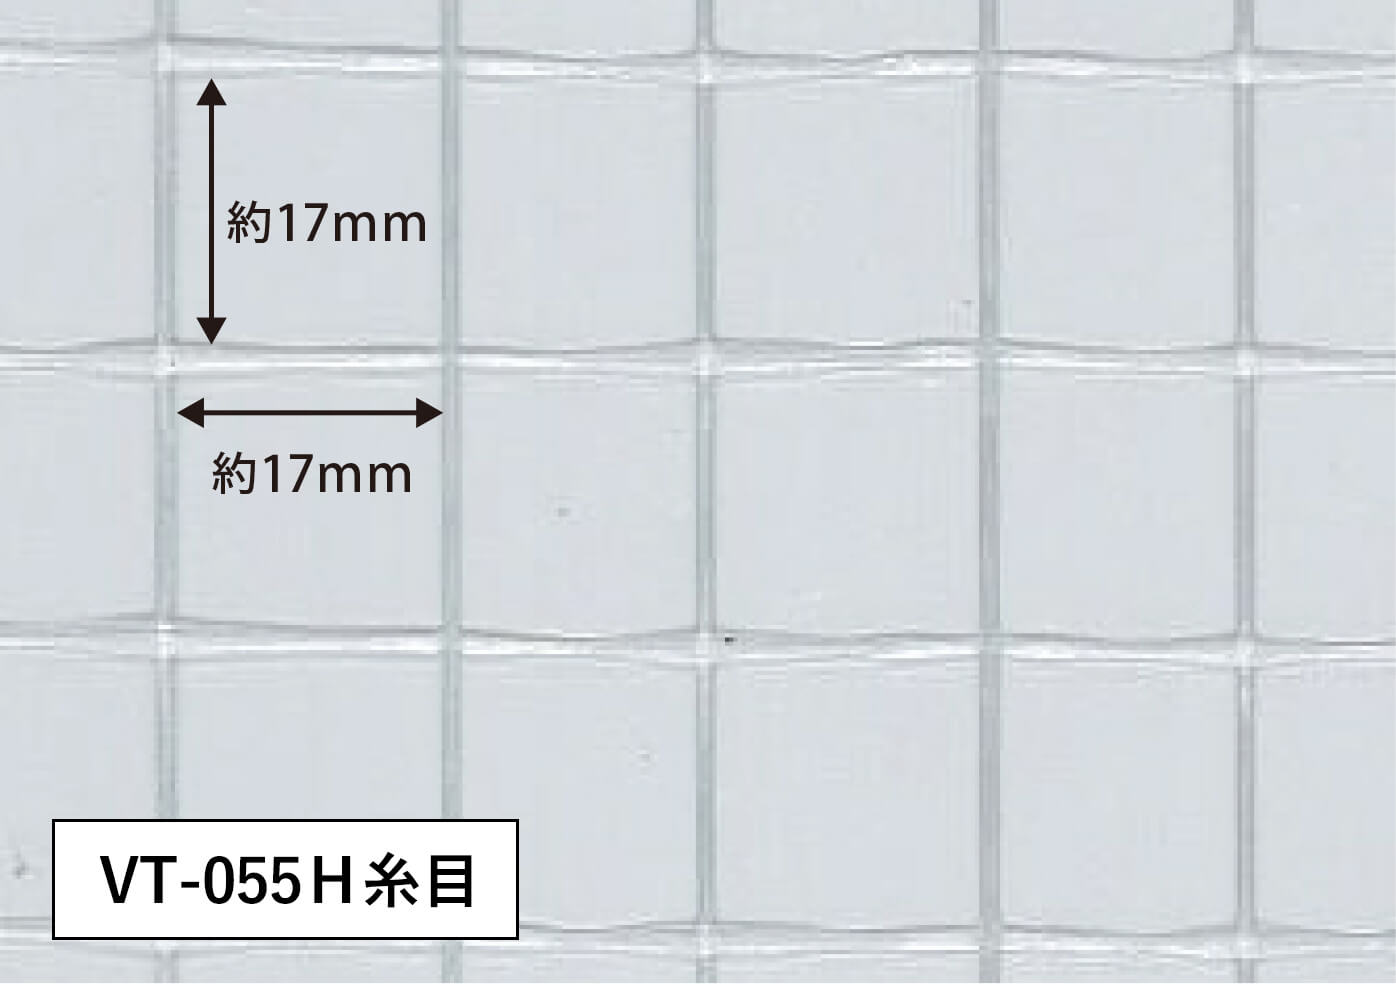 VT-055H 糸目図